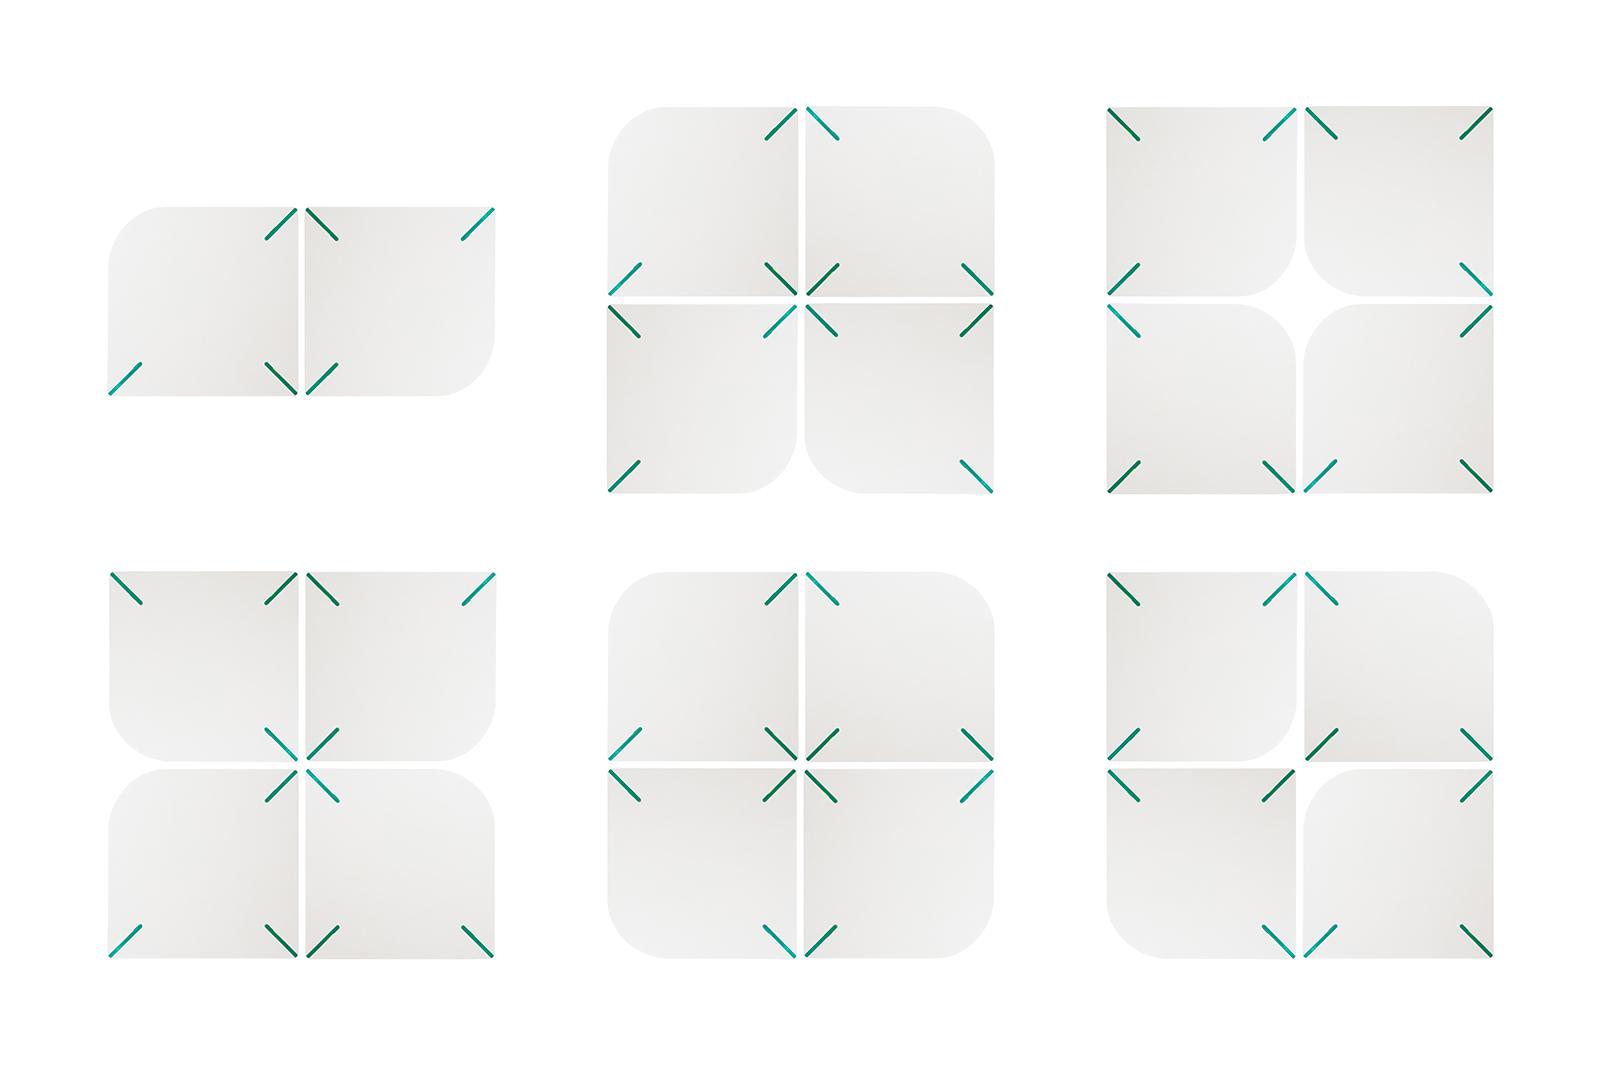 durodeco_Radius Table (4).jpg